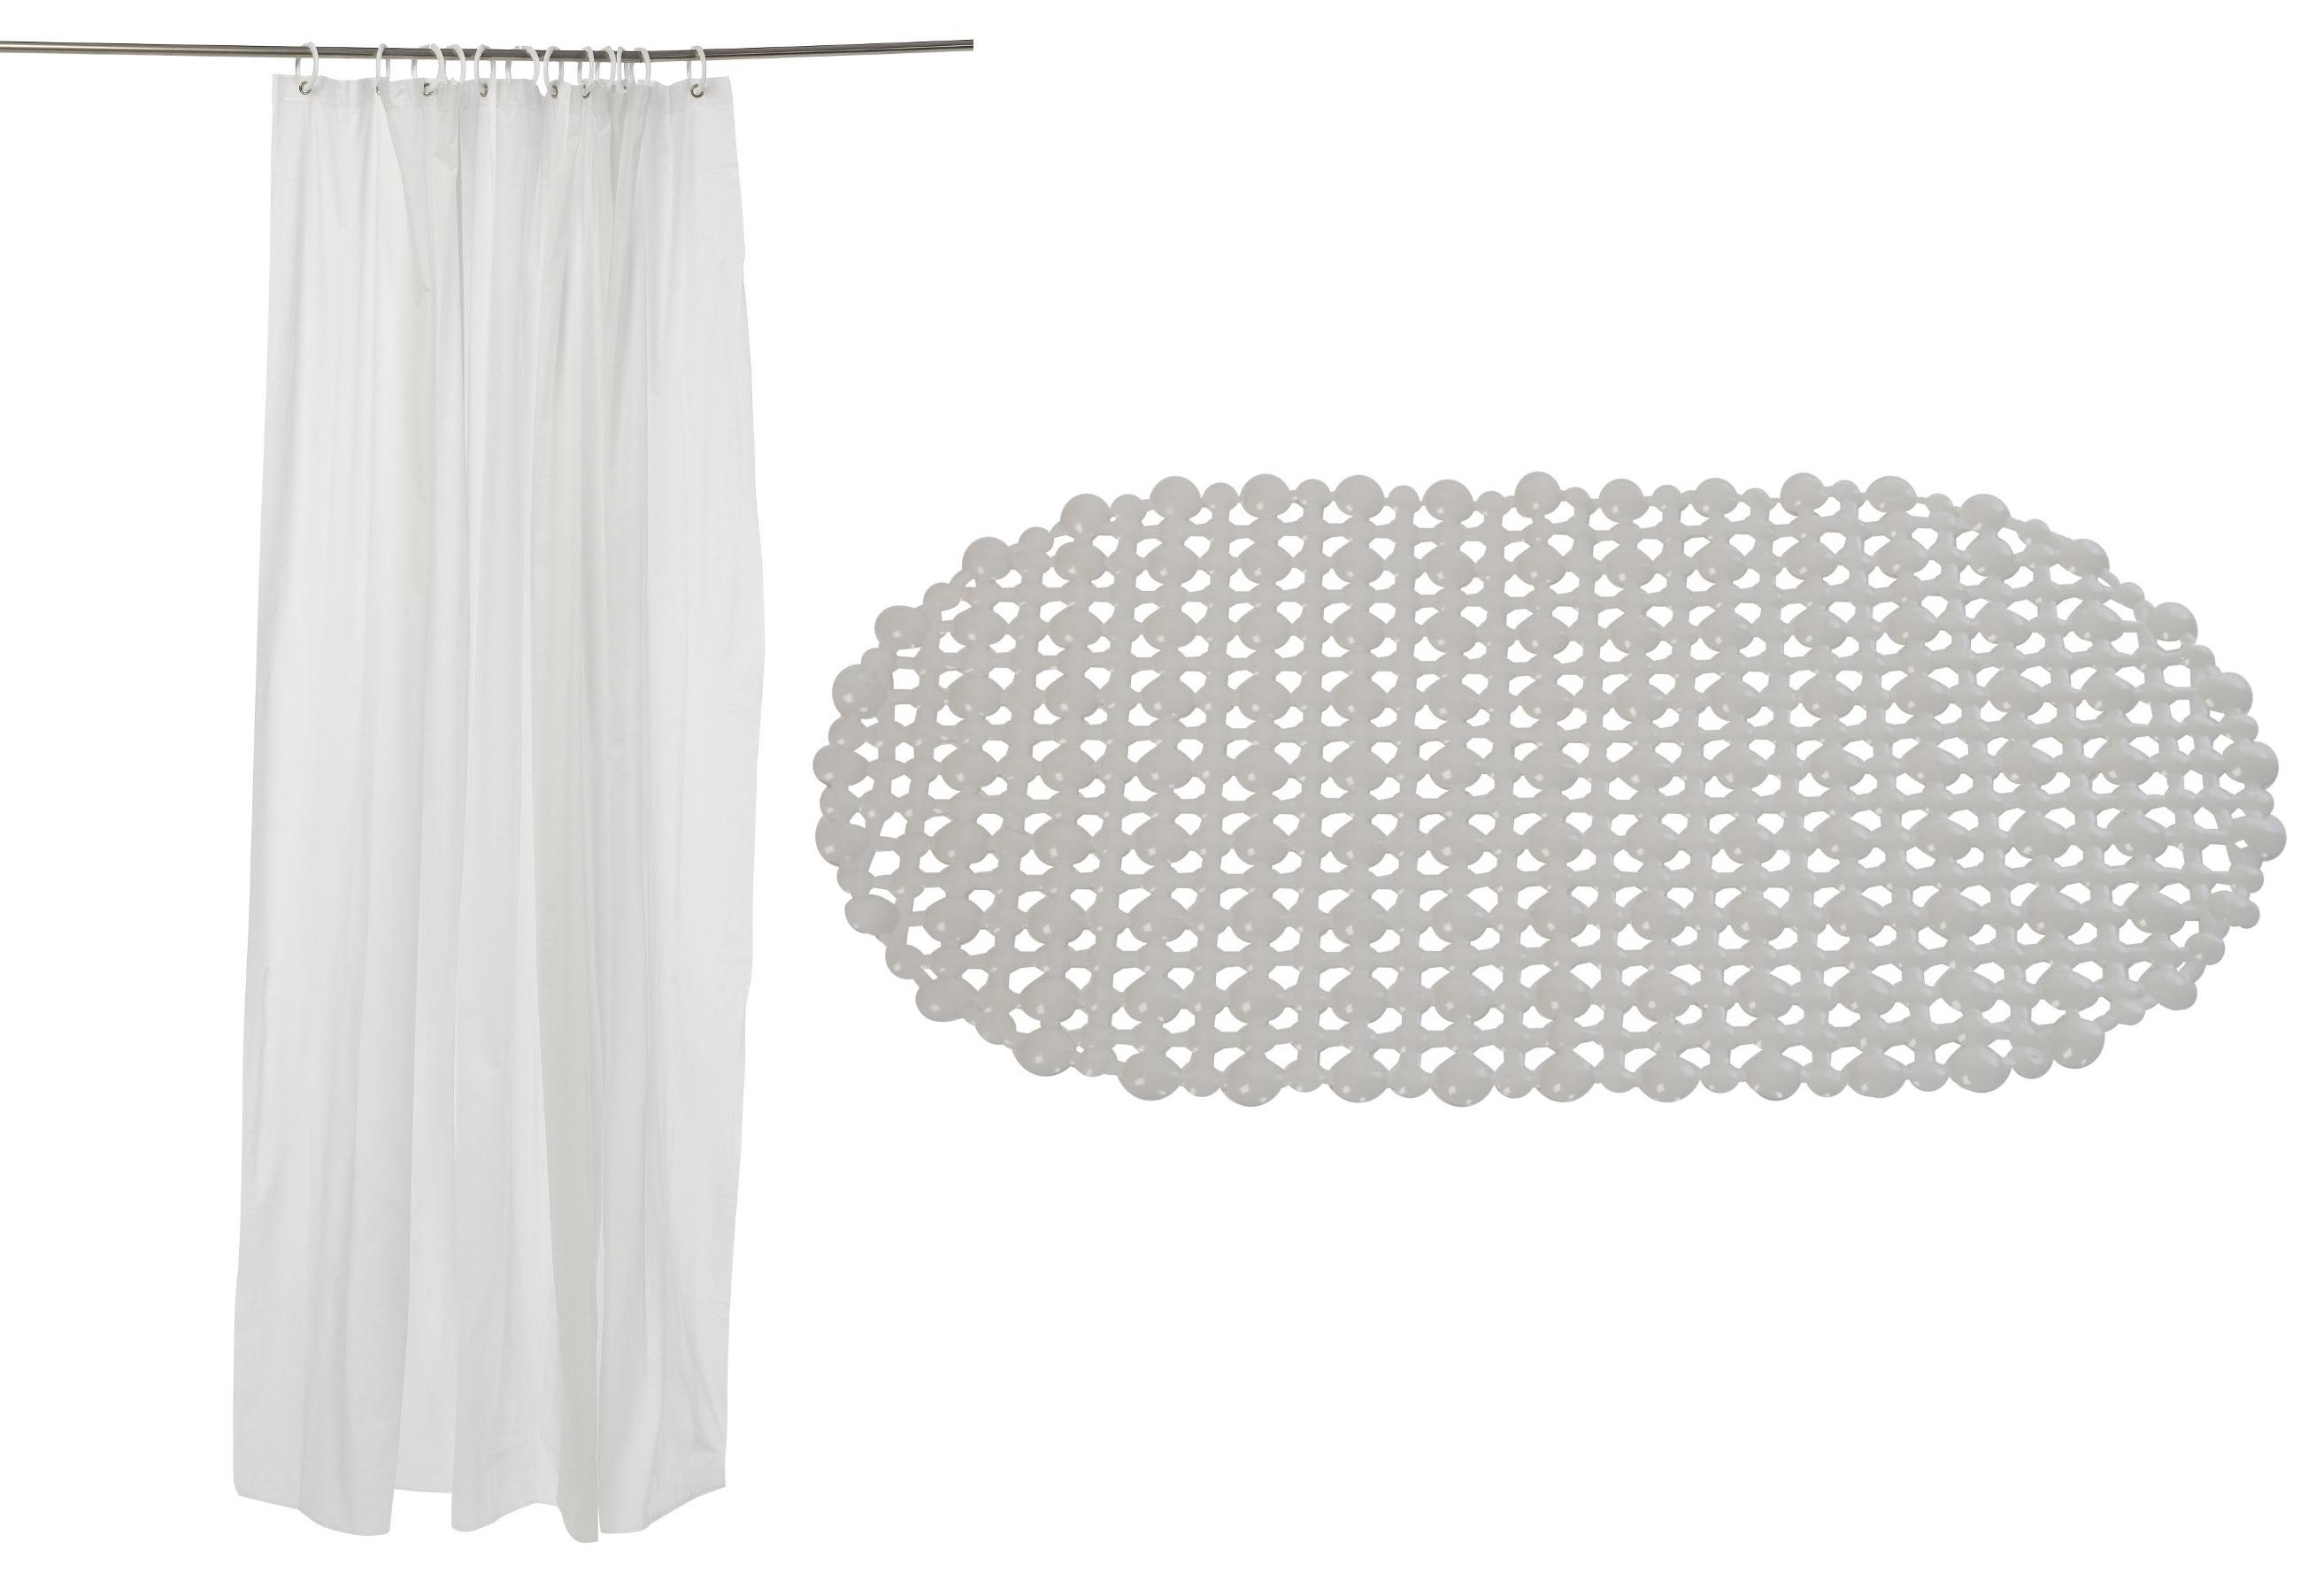 Bath Mat Sets White : White bath mat shower curtain set vinyl easy care